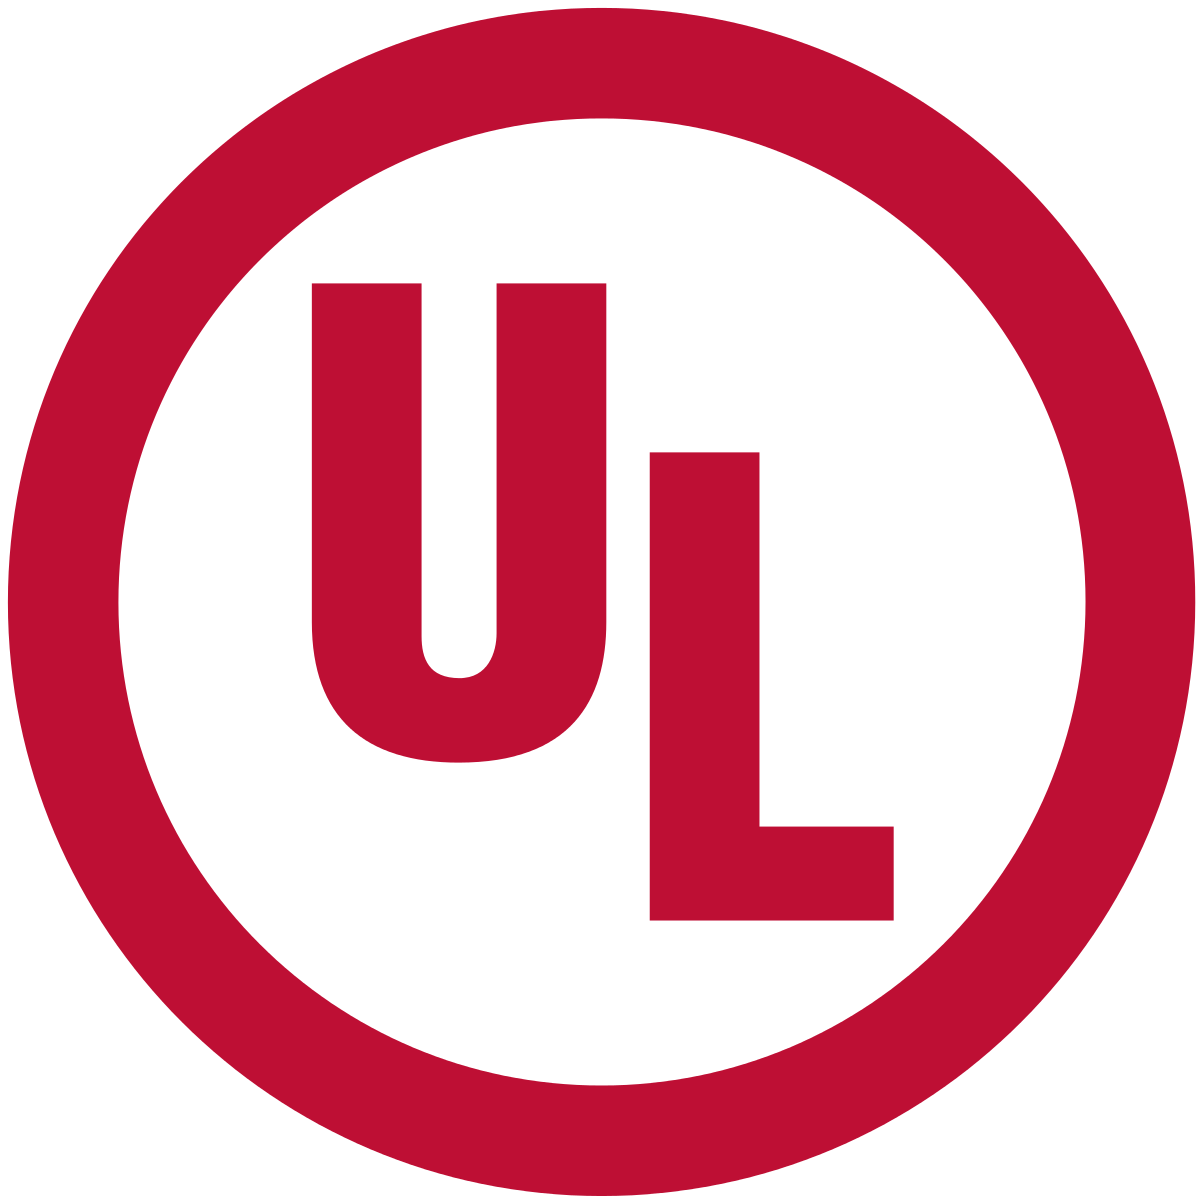 UL_Mark.png